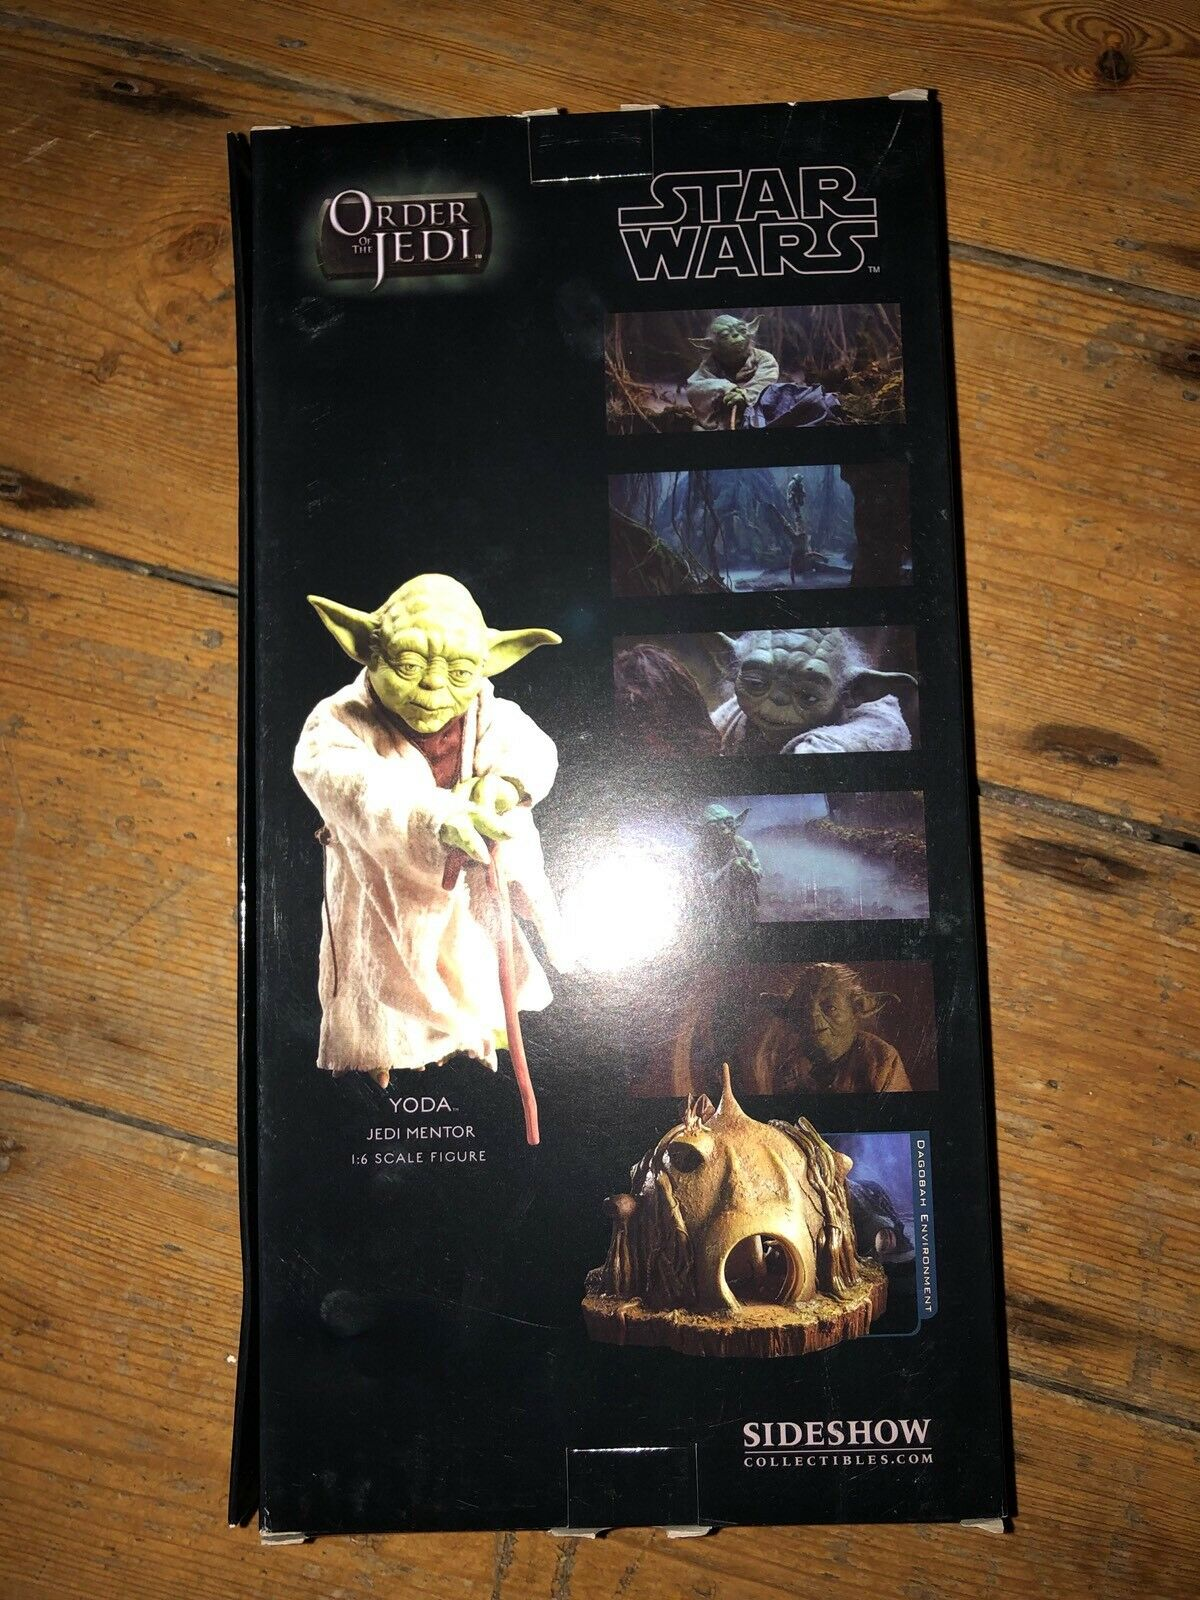 Sideshow Star Wars 0rder Of The The The Jedi Yoda Jedi Mentor  AFSSC1046e f6c894